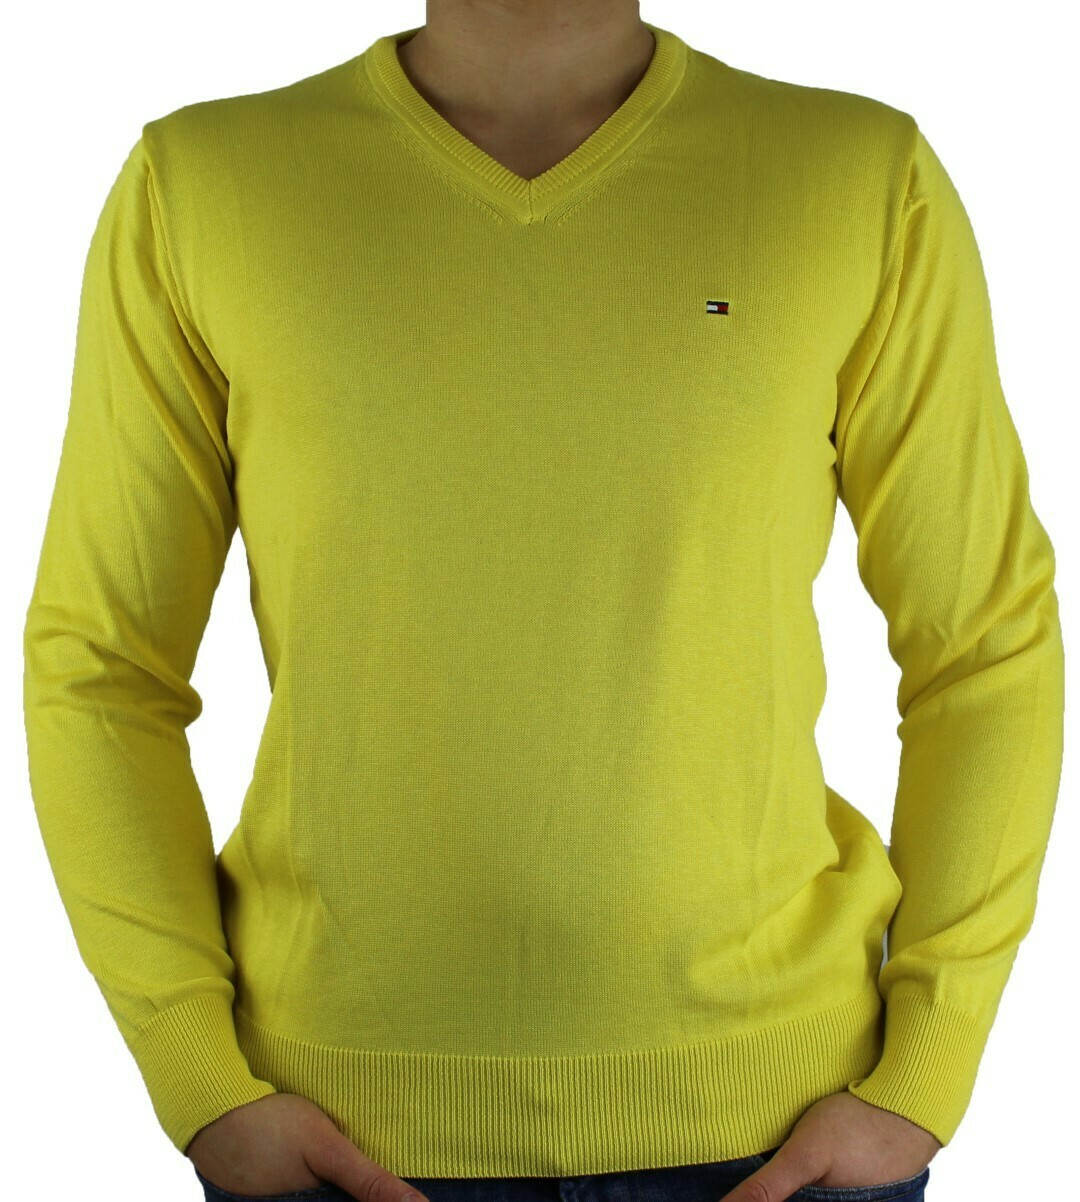 Hilfiger Denim V Neck Men's Pullover Yellow